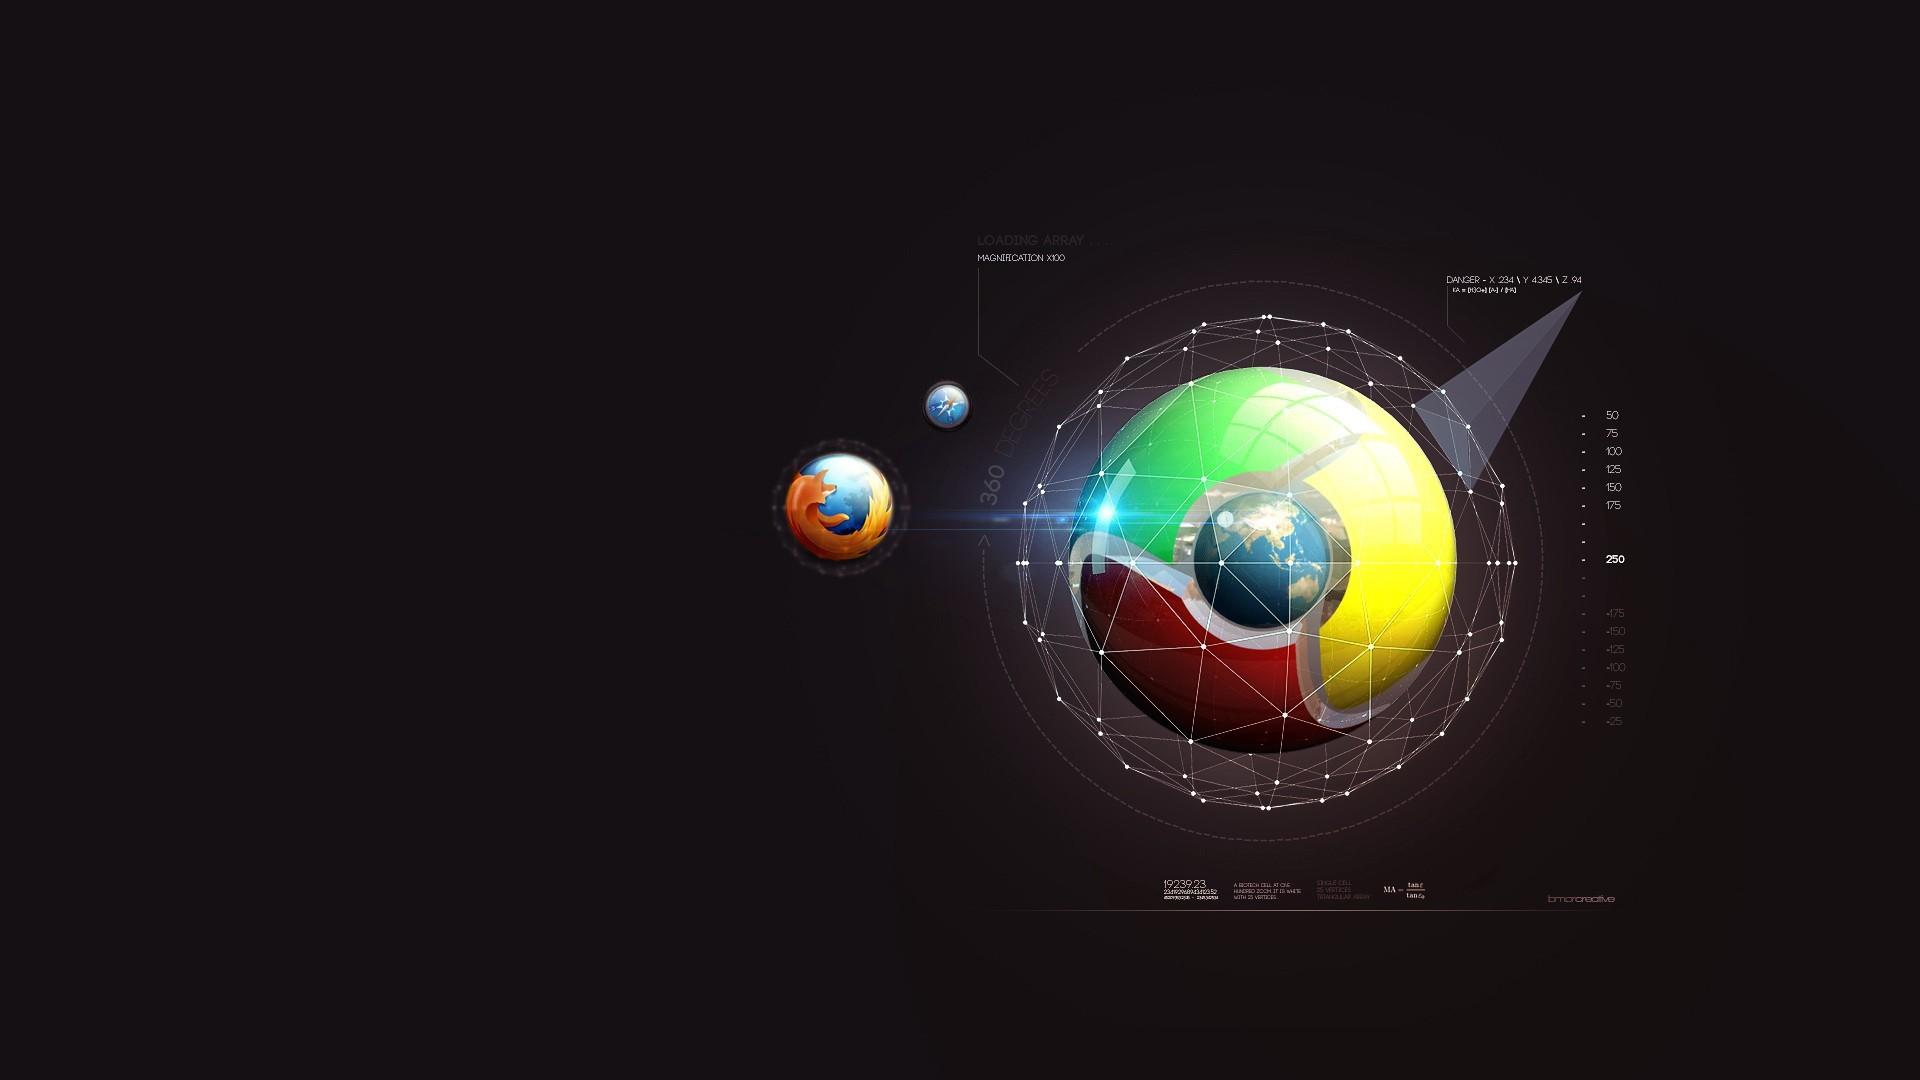 General 1920x1080 Mozilla Firefox Google minimalism Google Chrome digital art logo